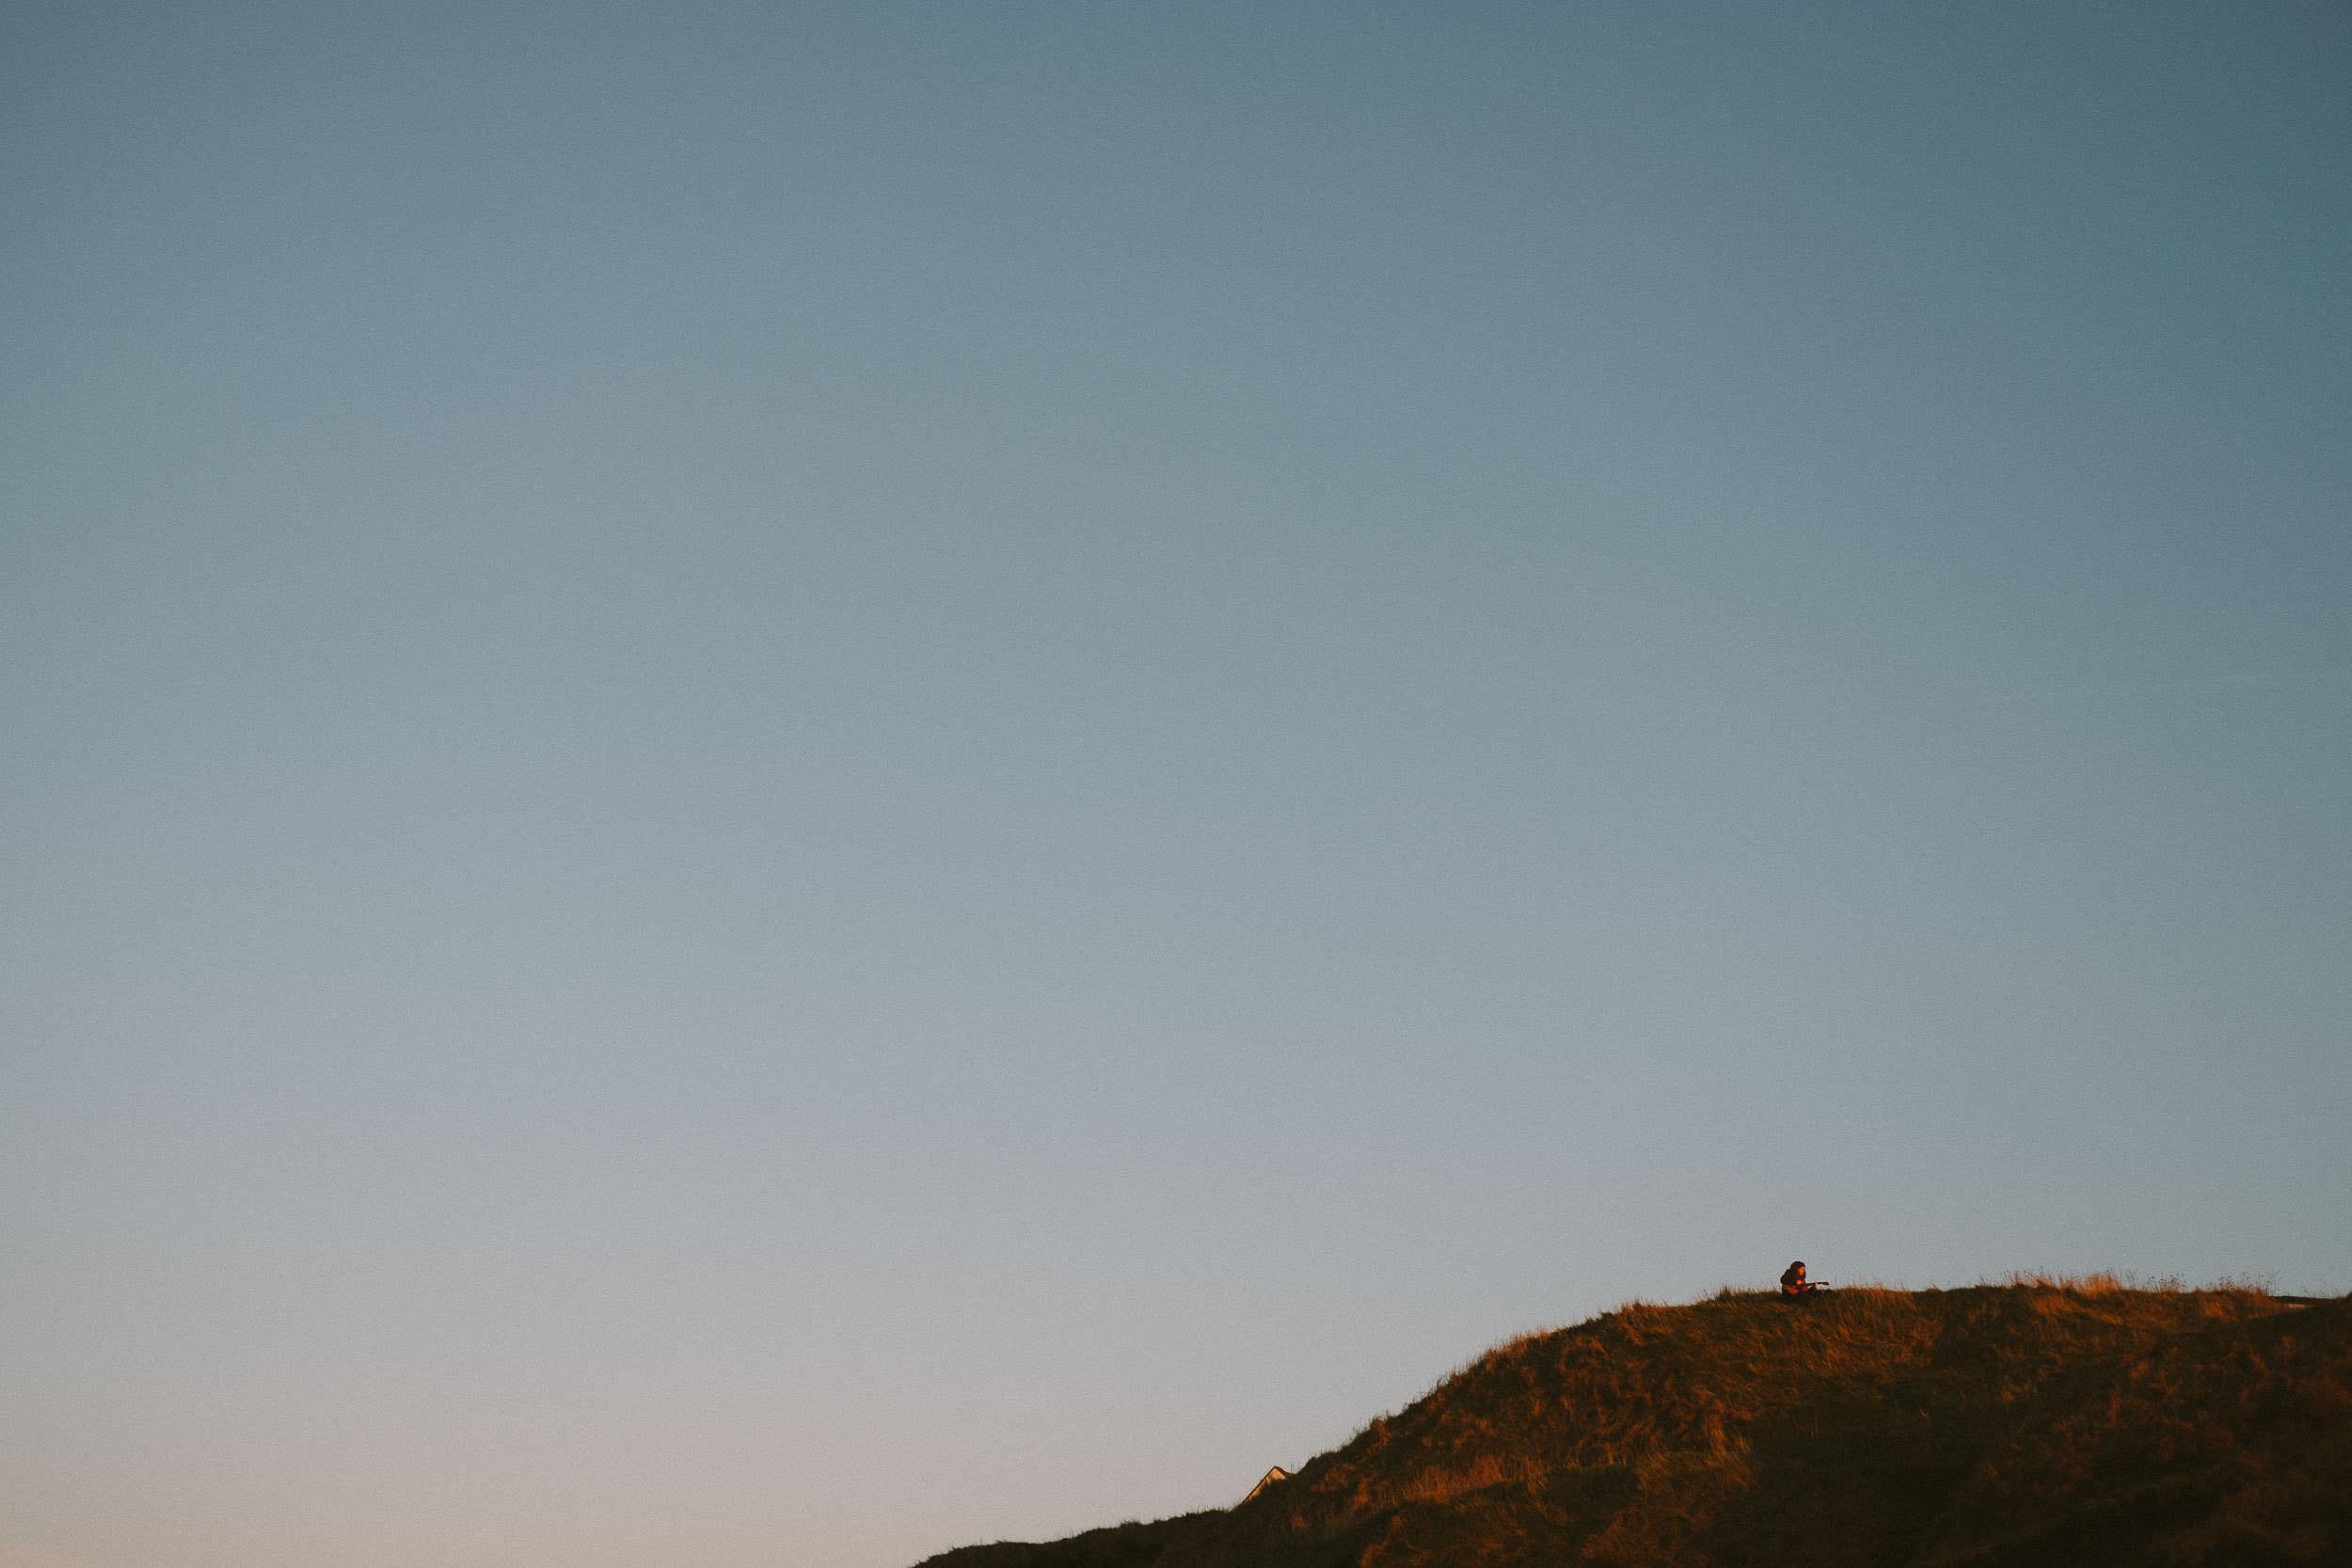 Girl playing guitar on clifftop on Northumberland coast